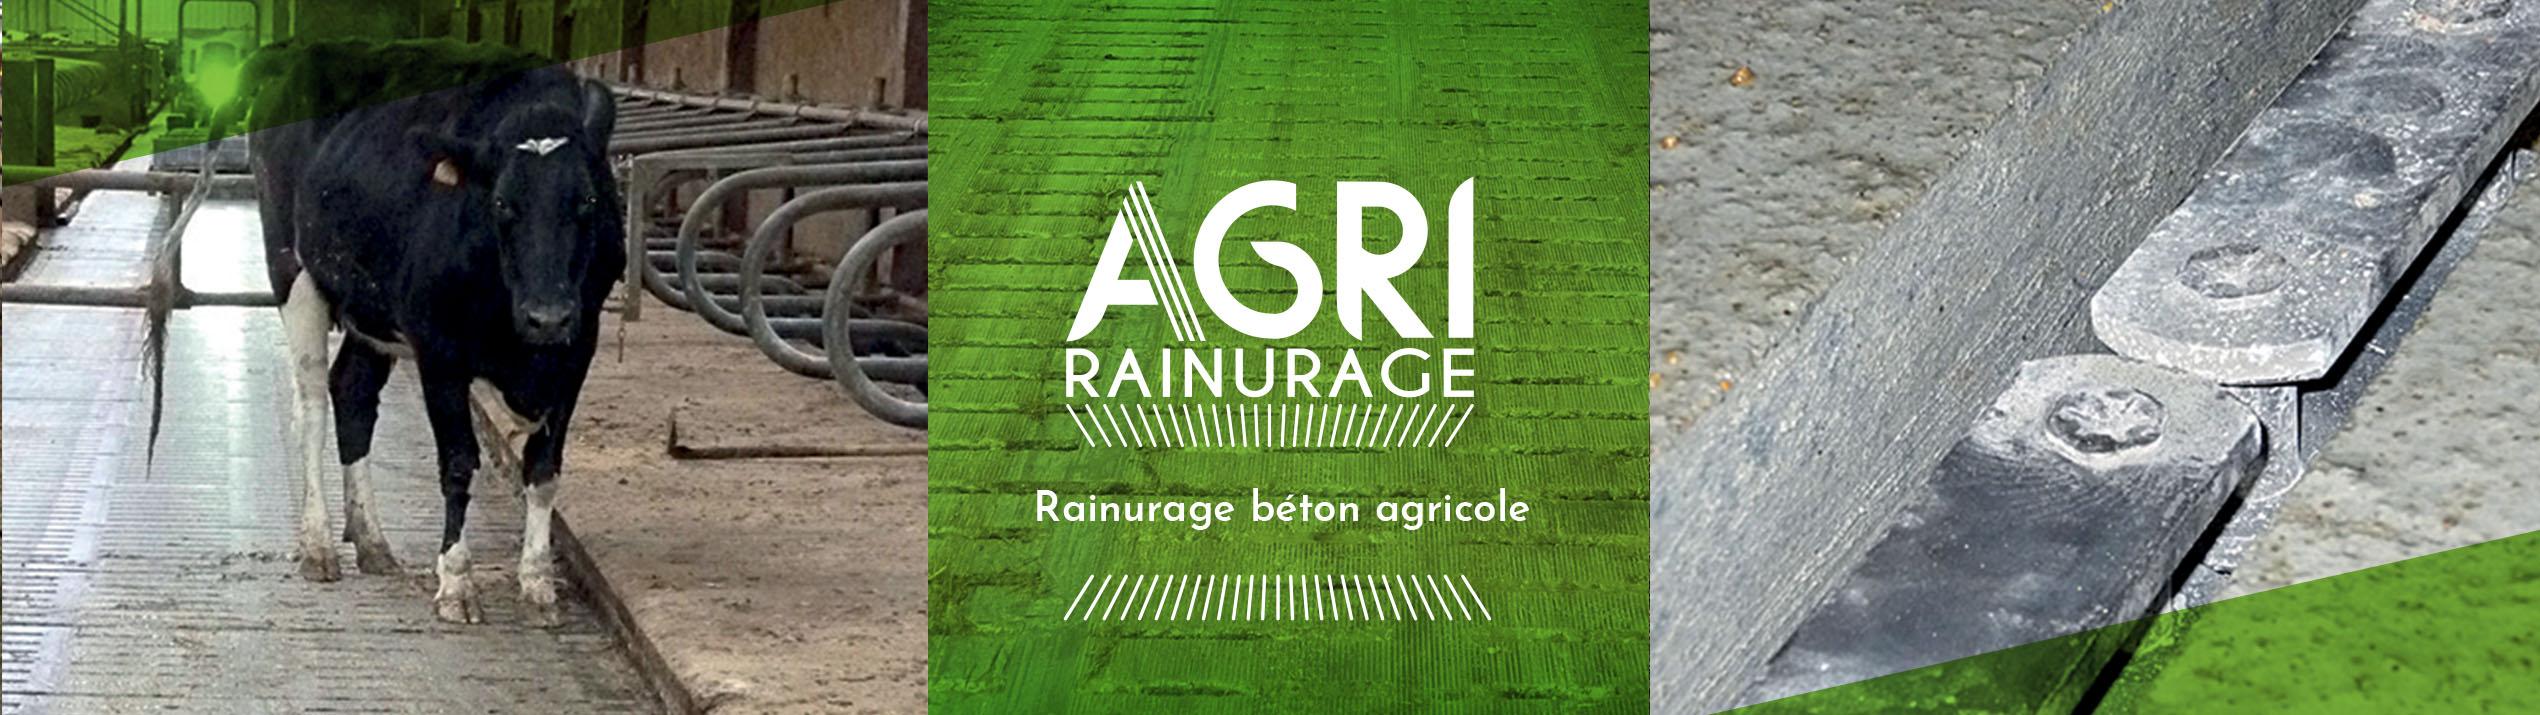 Rainurage béton agricole